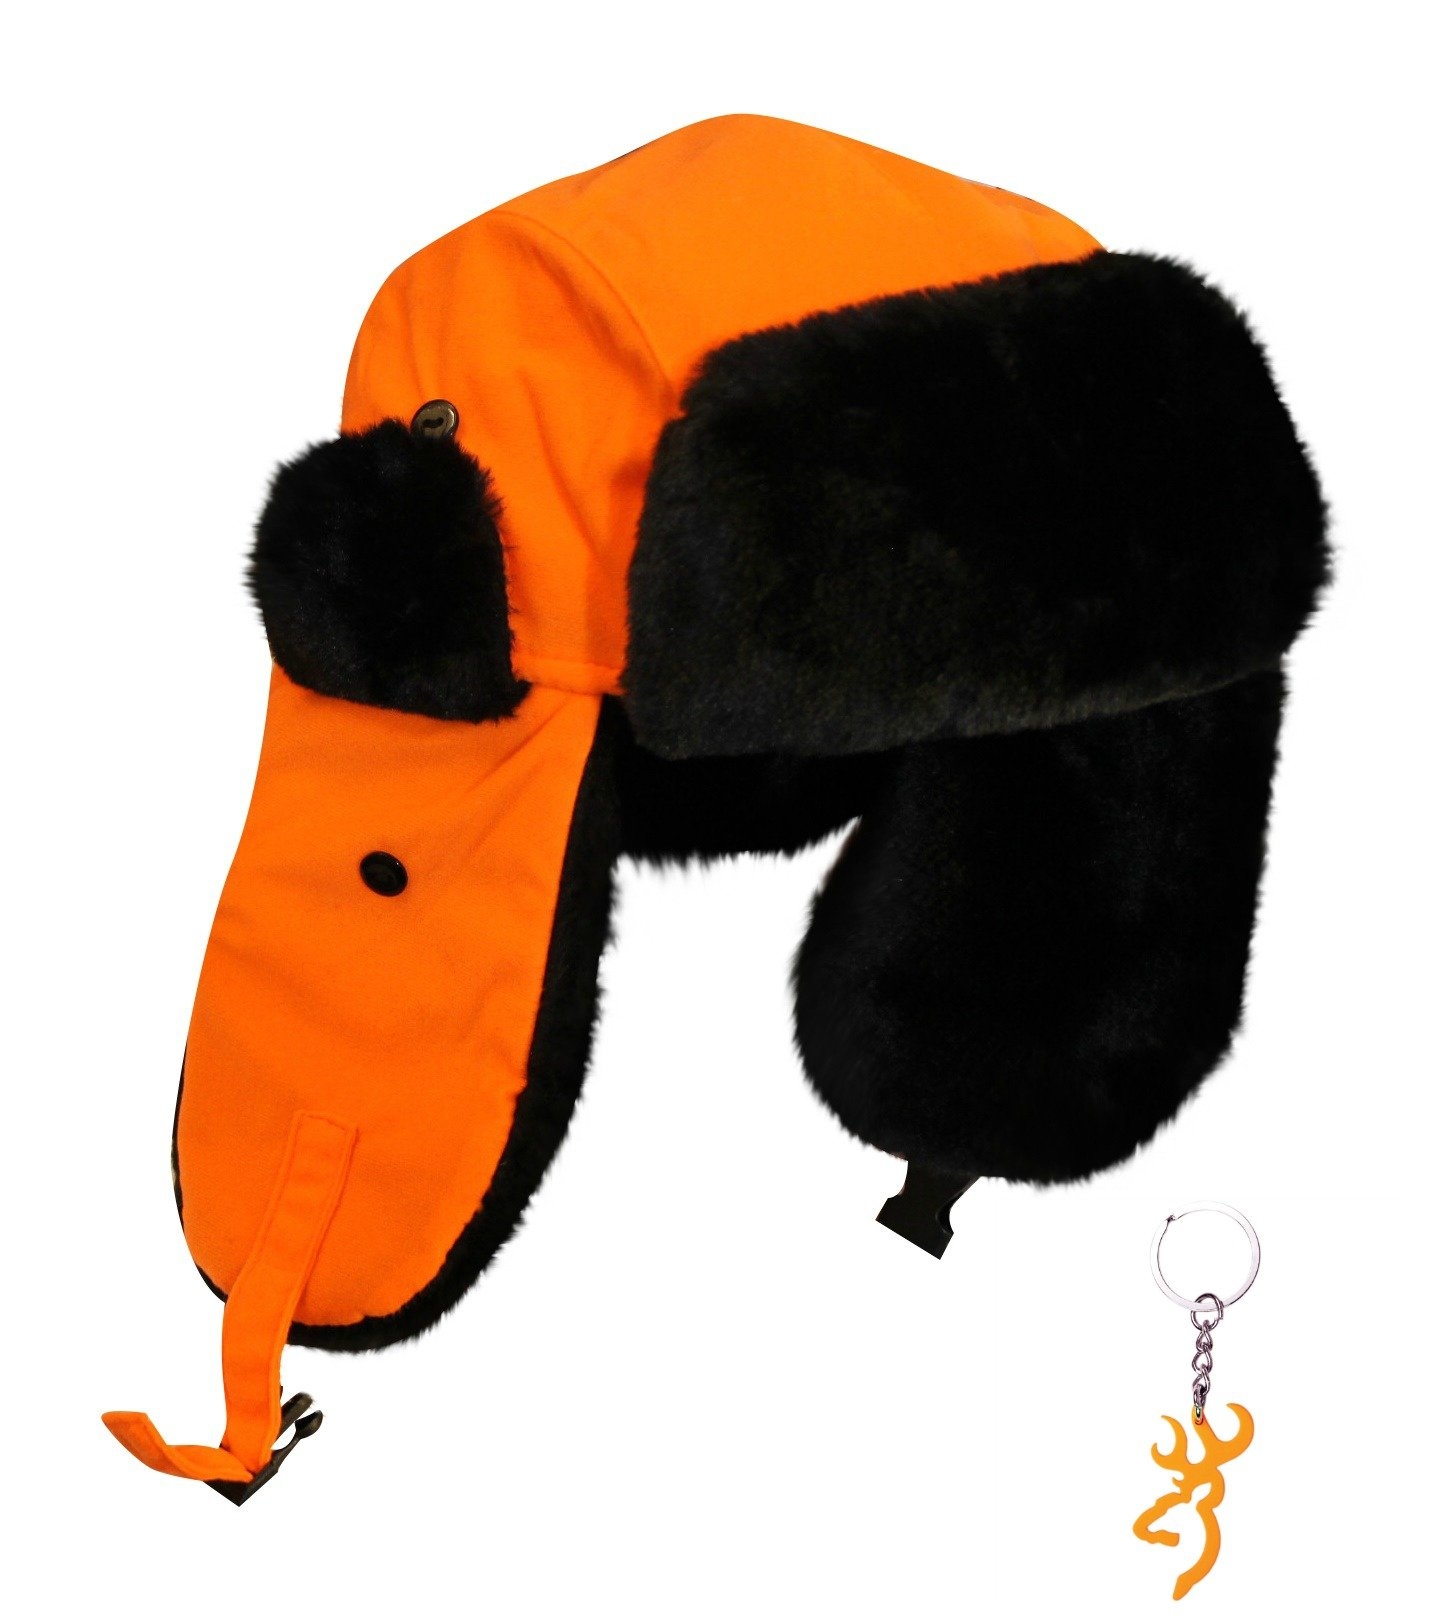 Blaze orange redhead hat